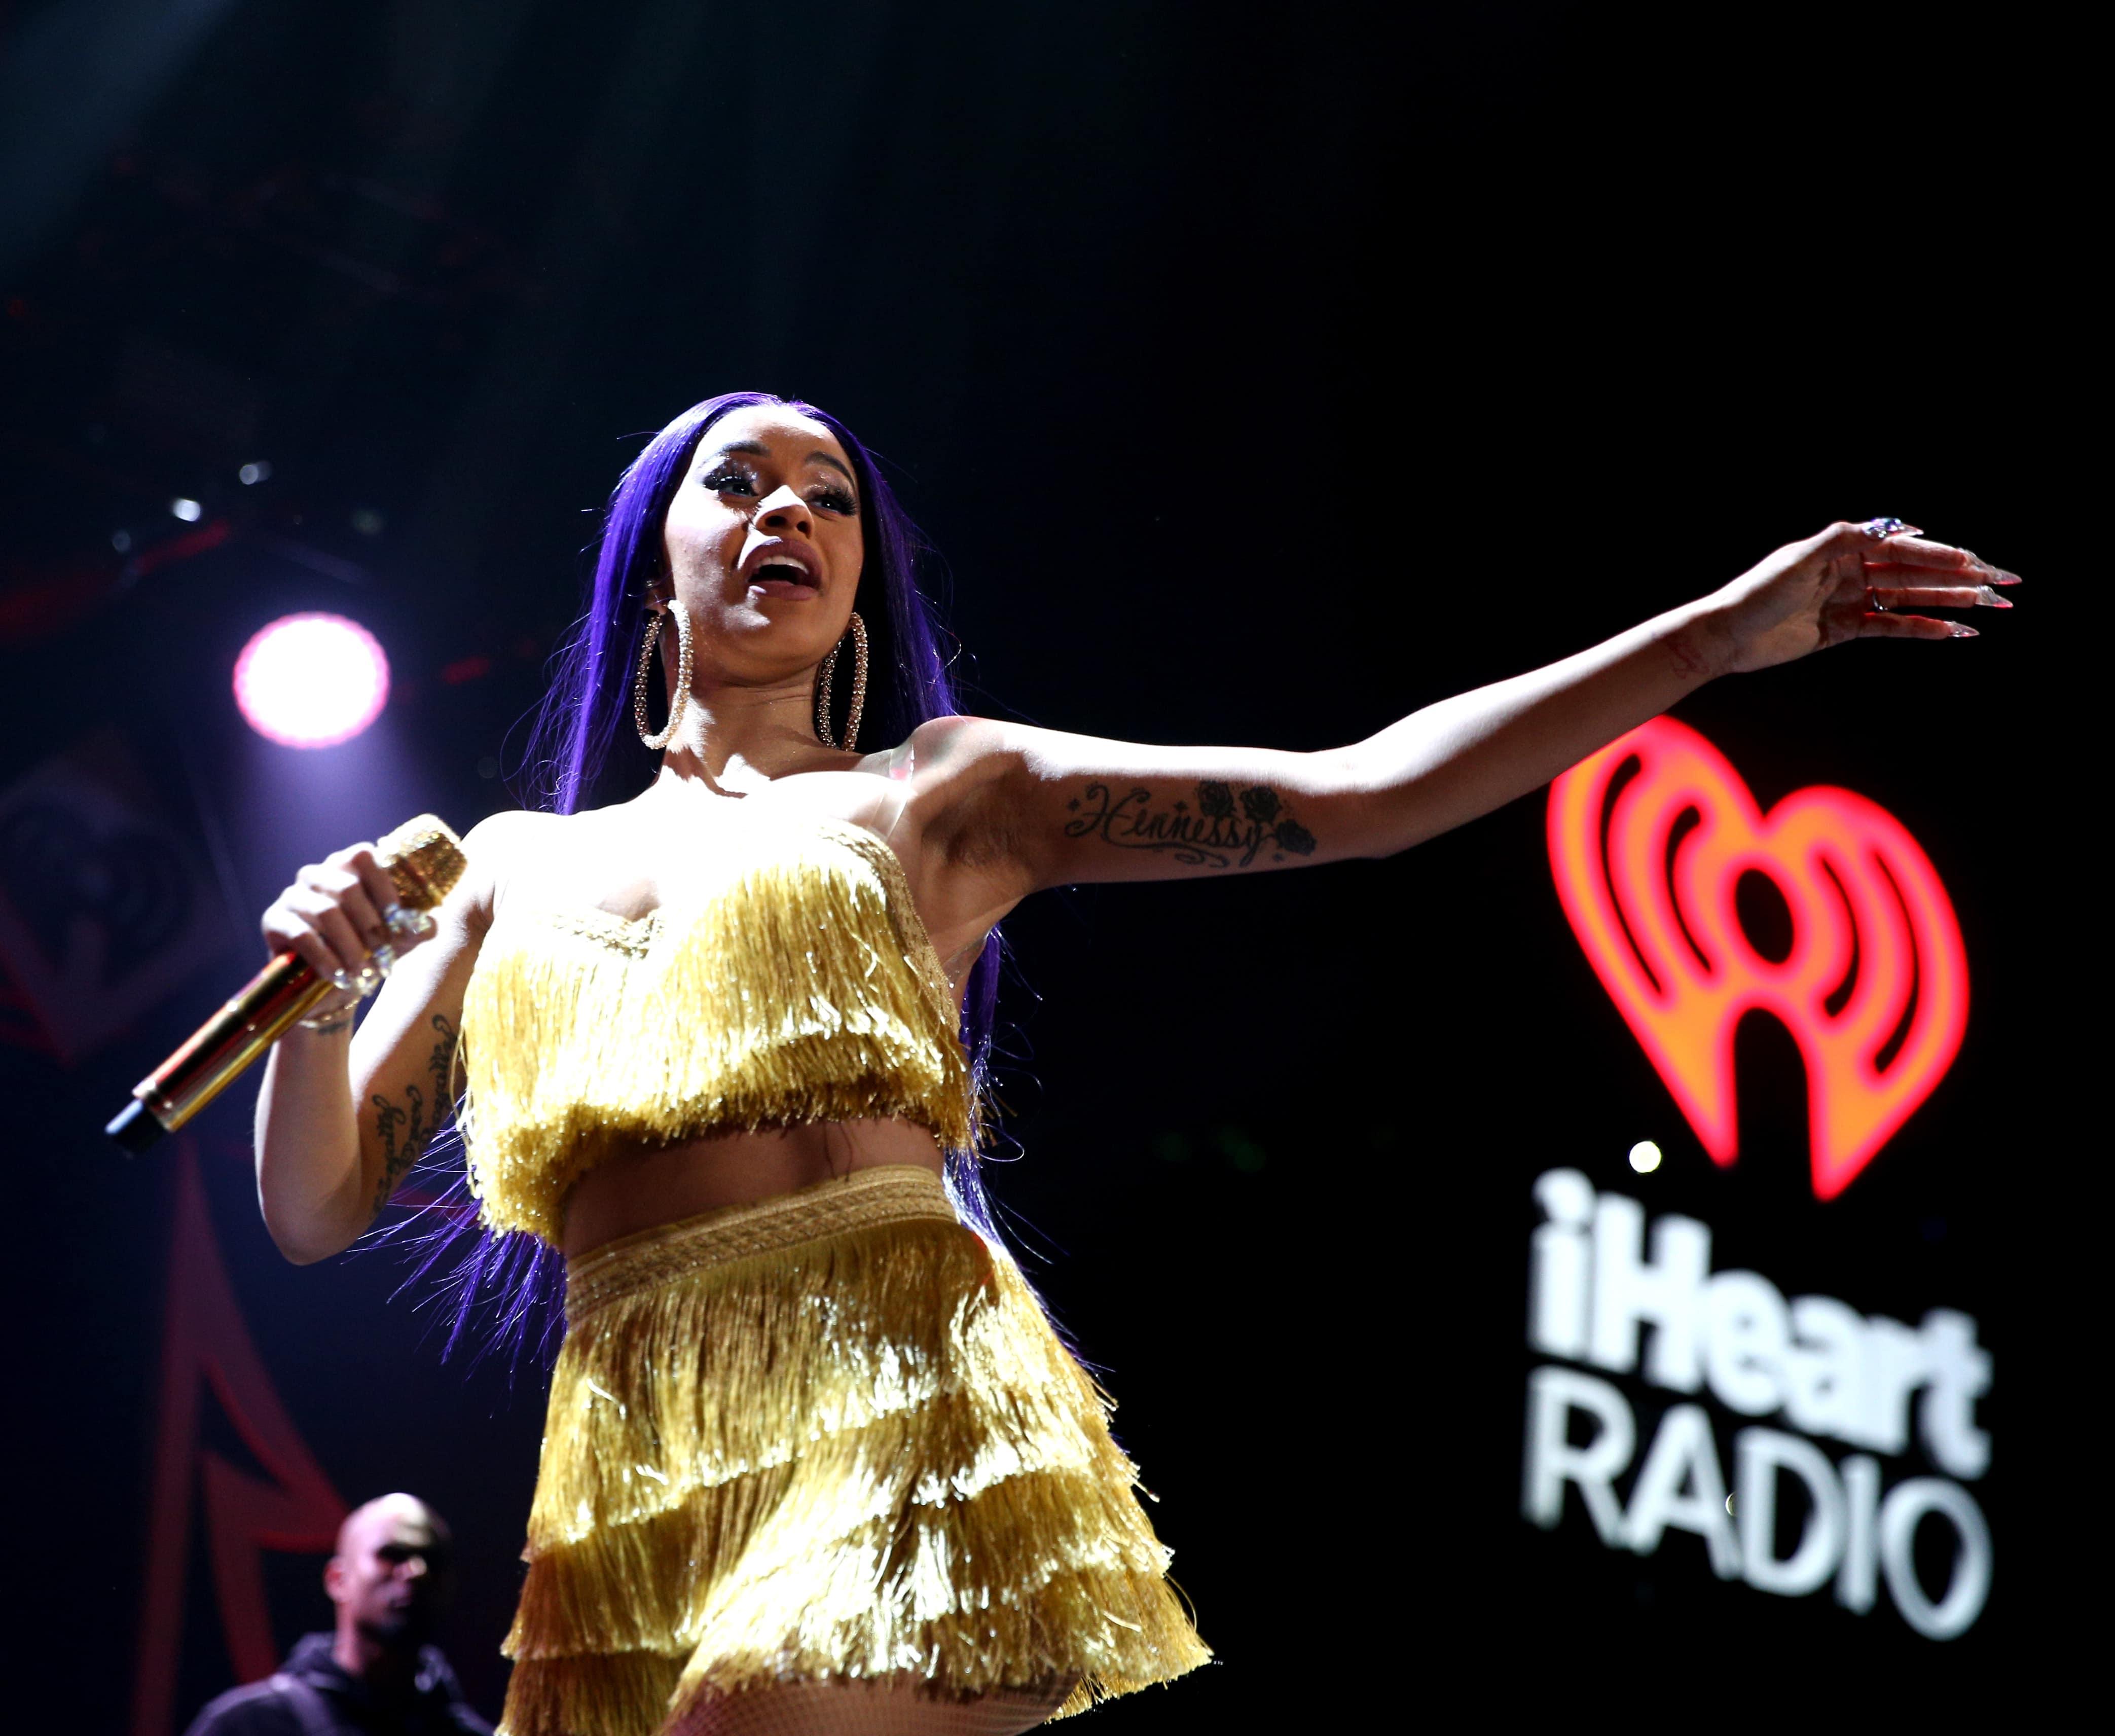 Cardi B Confirms She's Releasing a New Album in 2019